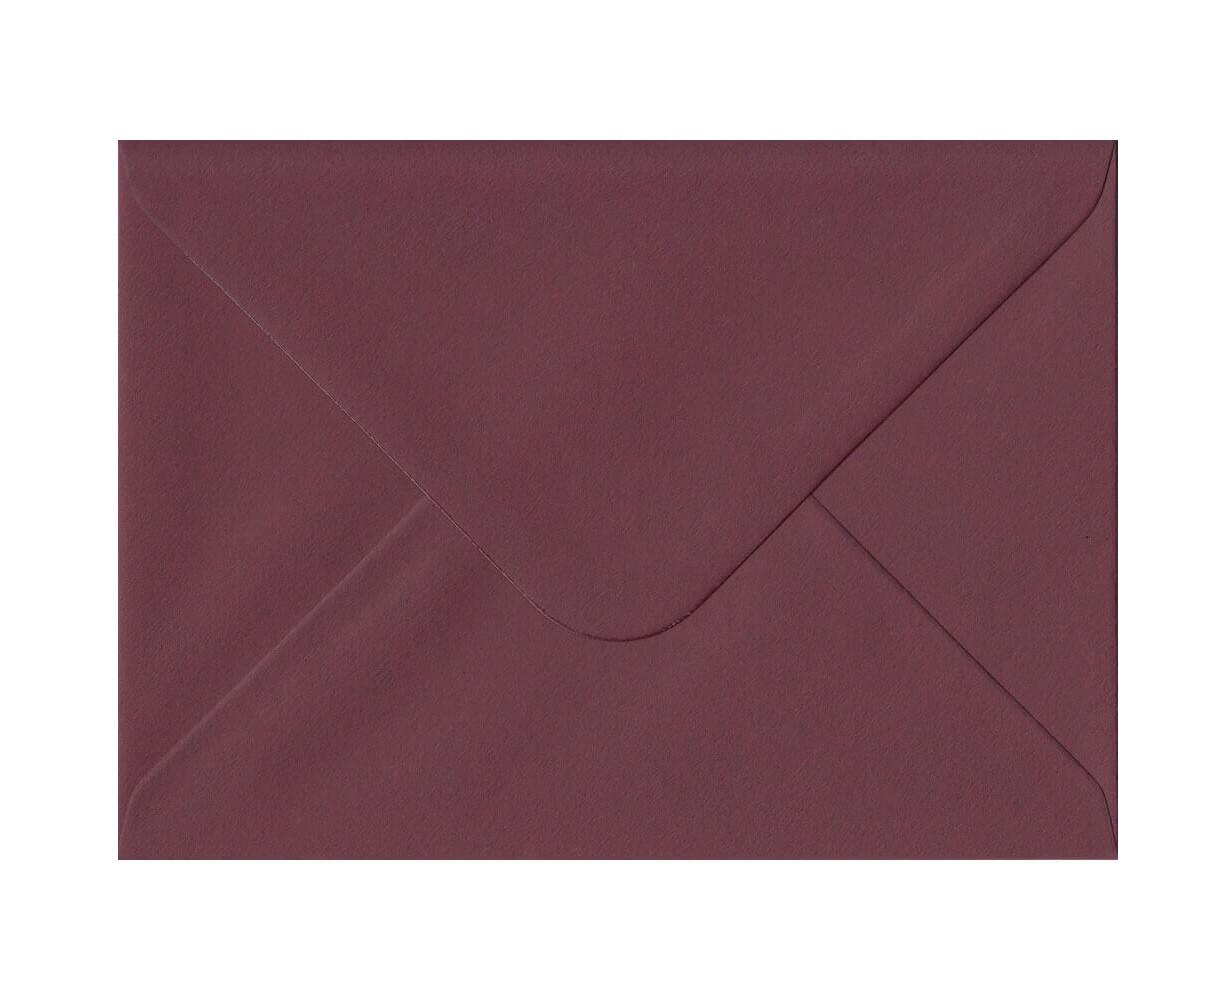 25 Sobres rectangular 15 x 22.5 cm 100g Burano Vino